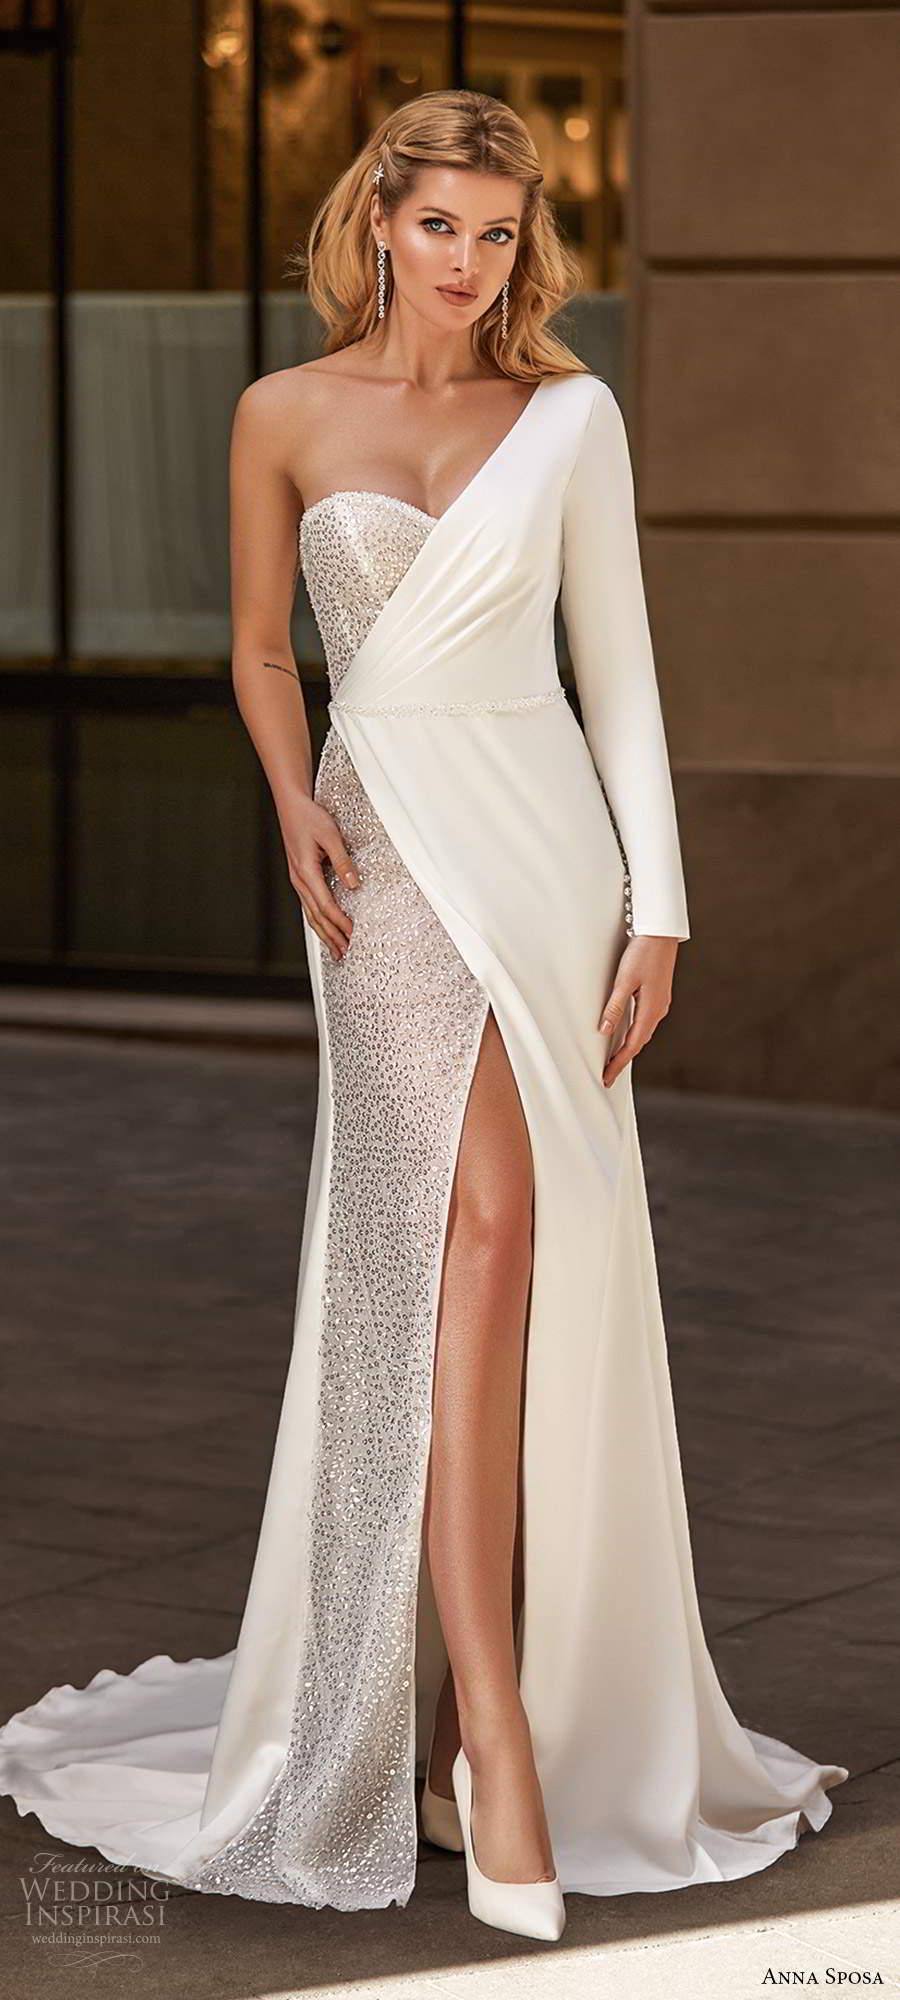 anna sposa 2021 bridal one shoulder long sleeves asymmentric sweetheart neckline embellished sheath wedding dress slit skirt  chapel train (1) mv